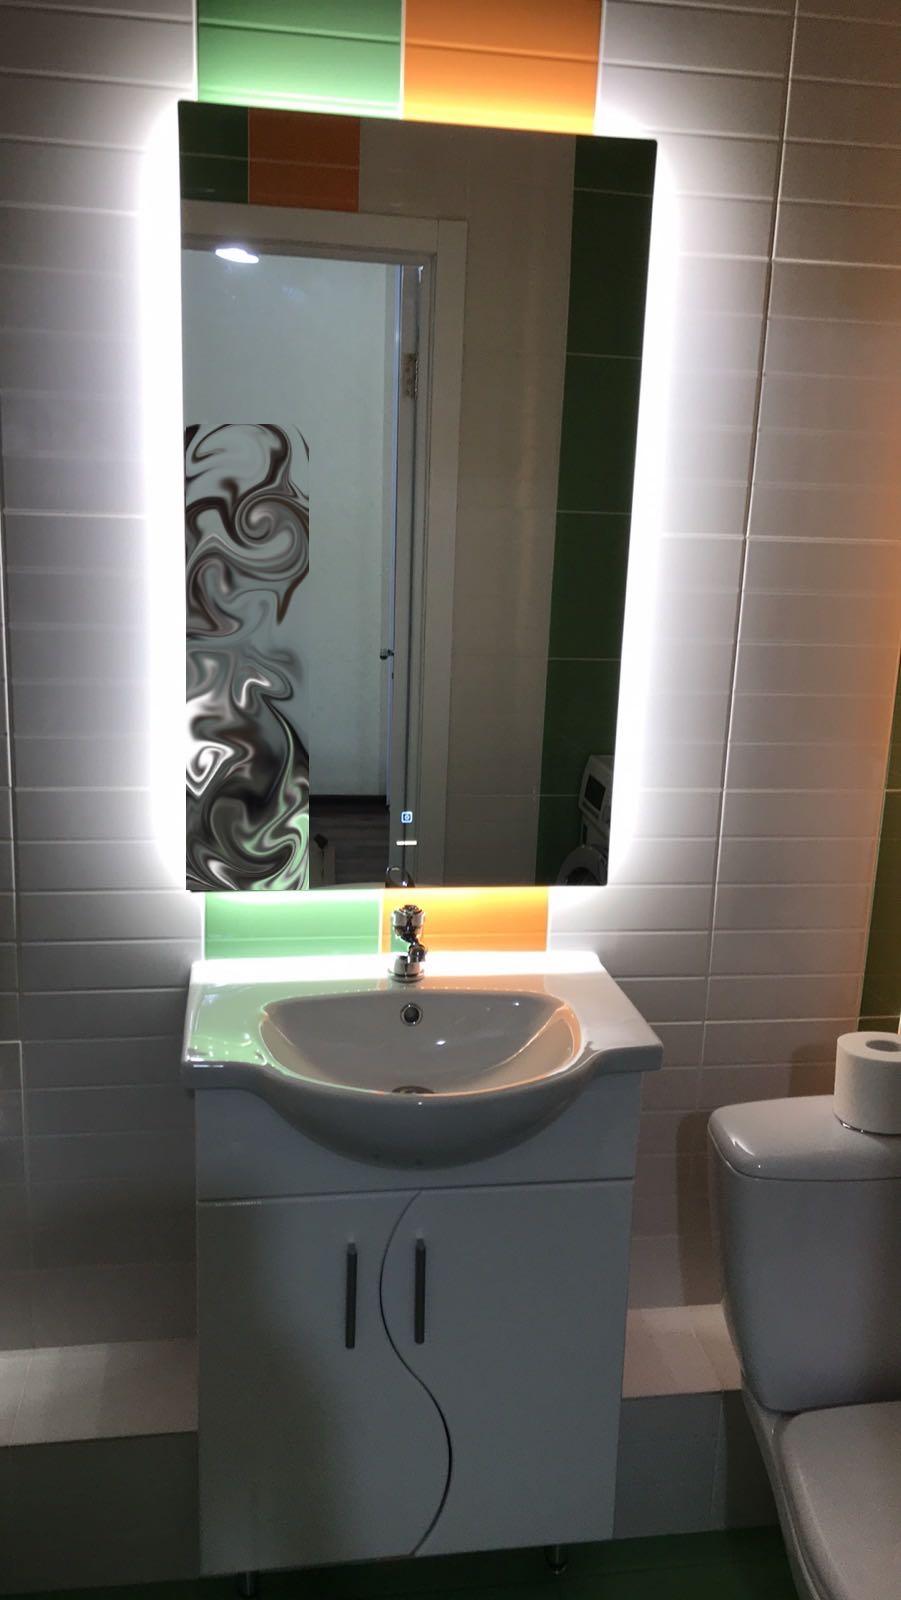 Установка подсветки зеркала в ванной комнате в Самаре